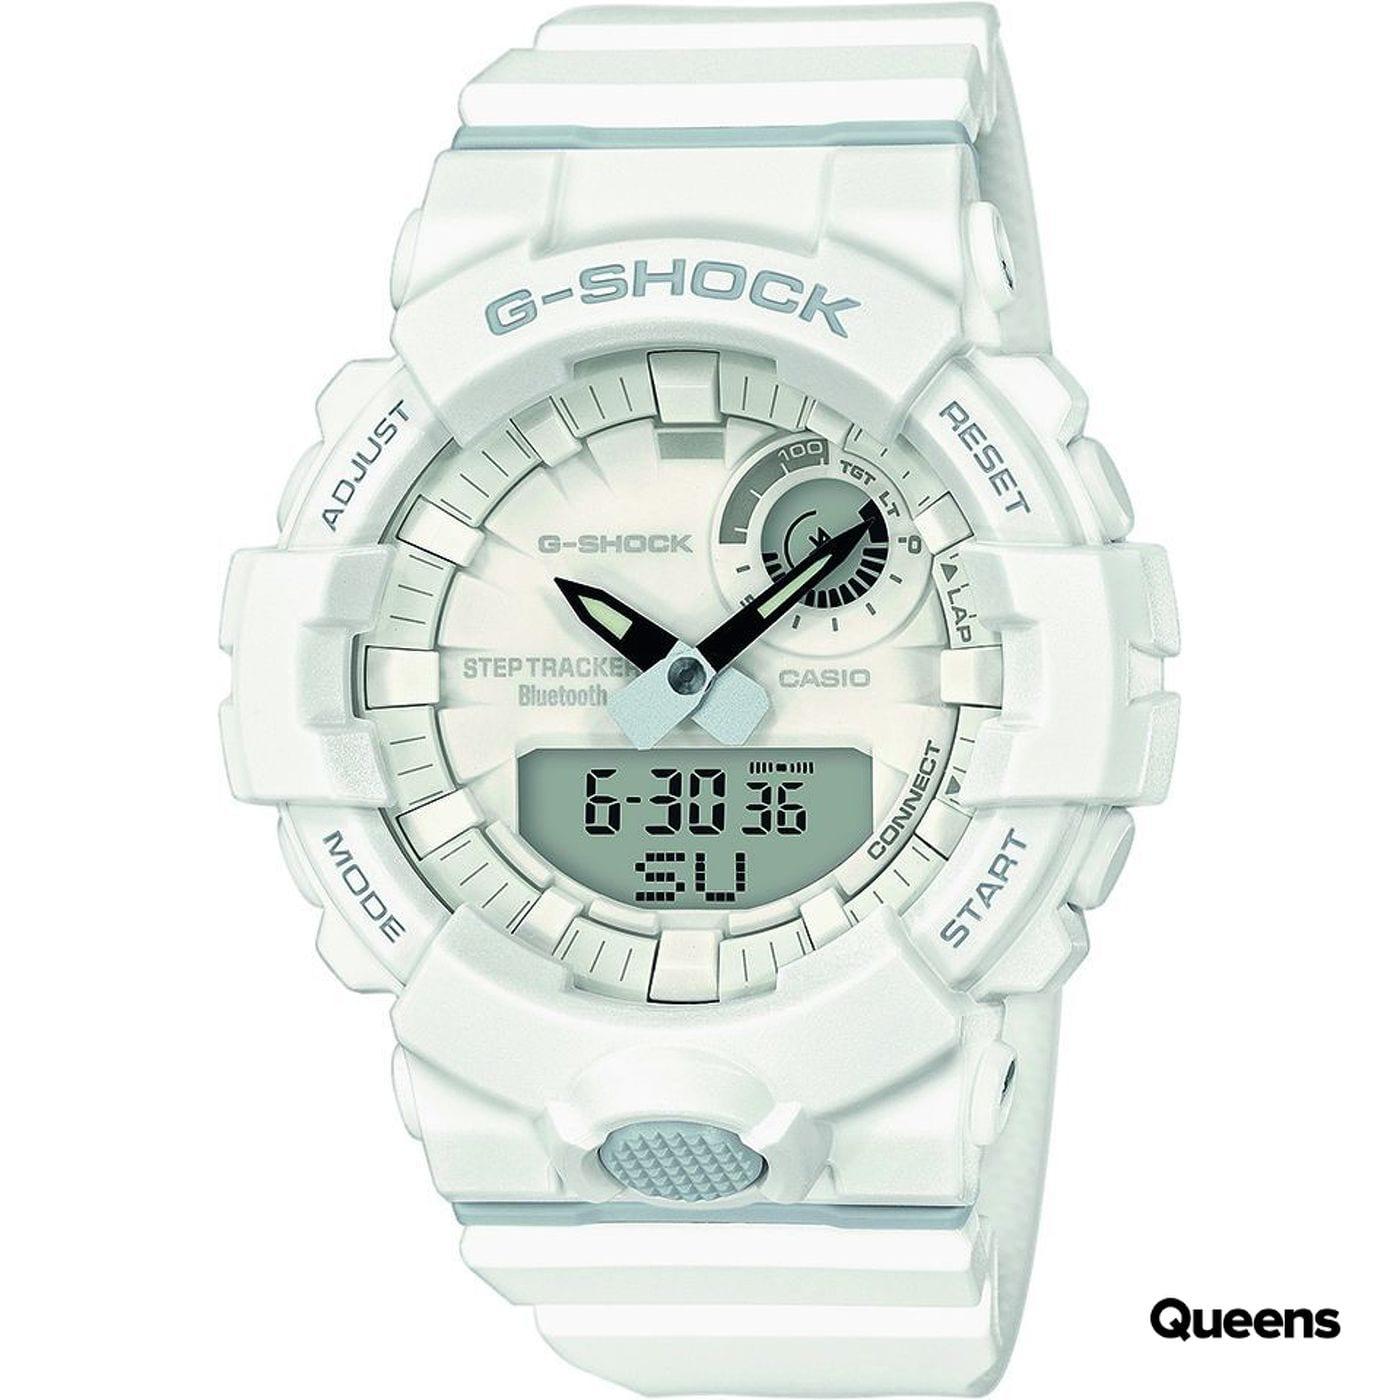 Casio G-Shock GBA 800-7AER weiß